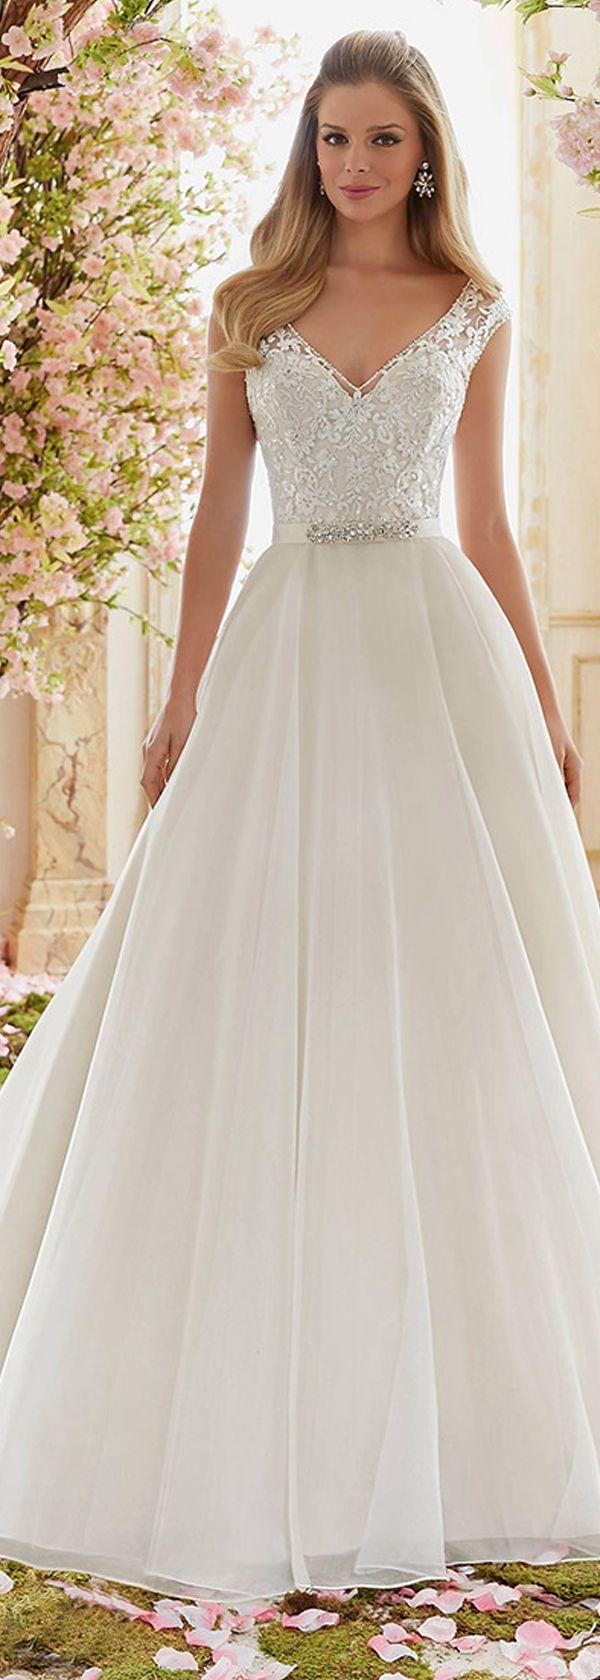 Wedding-Dresses-0717